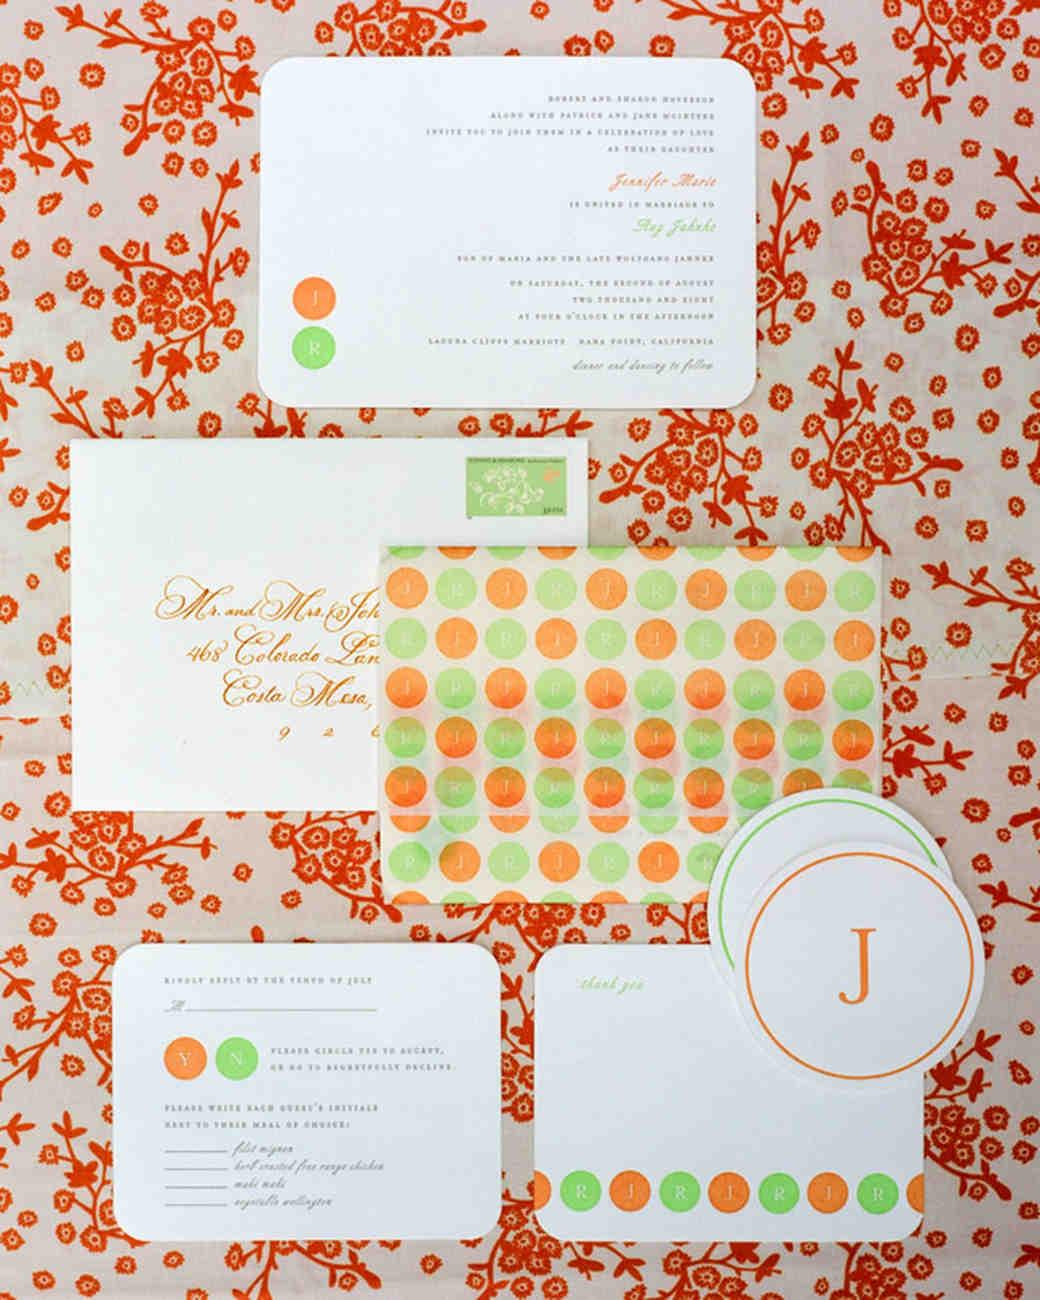 dot wedding invitation